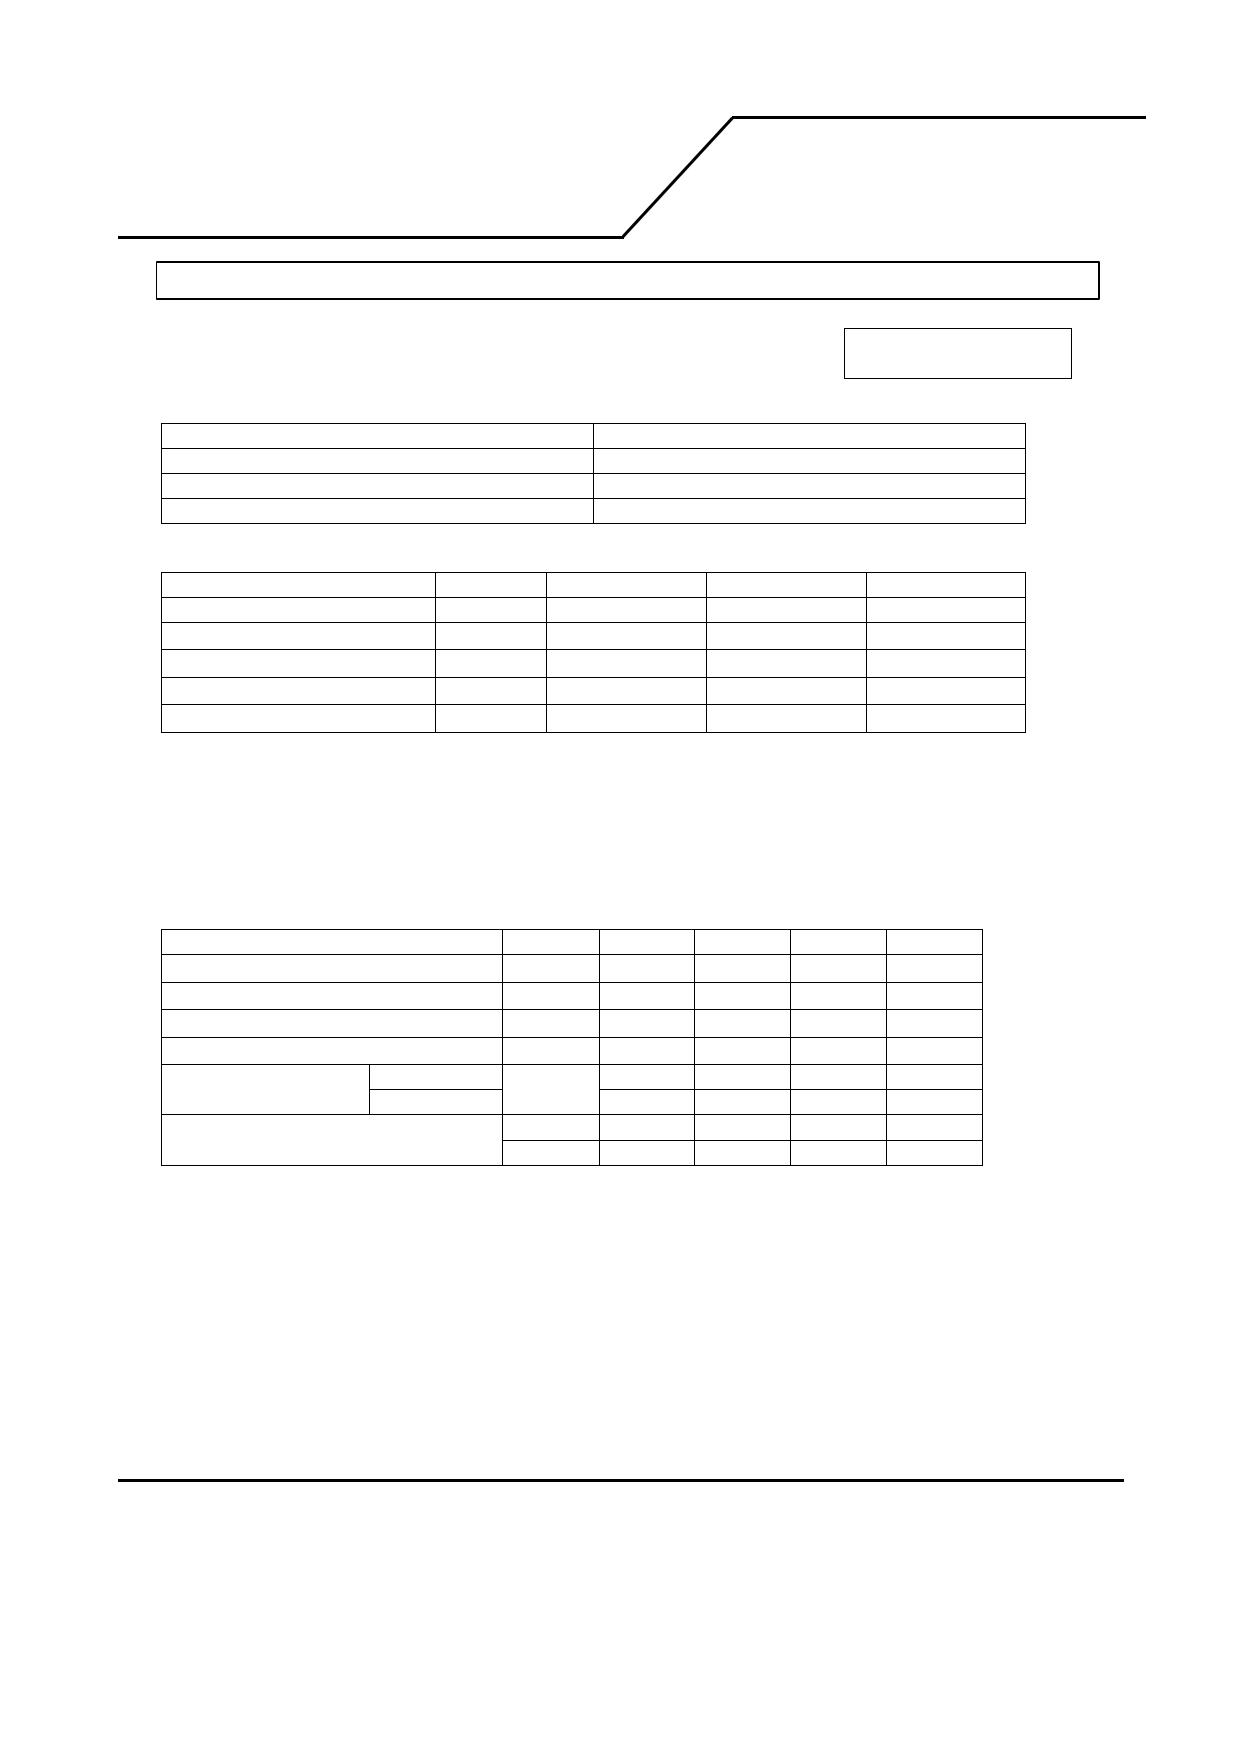 VNL08C351-INV datasheet, circuit